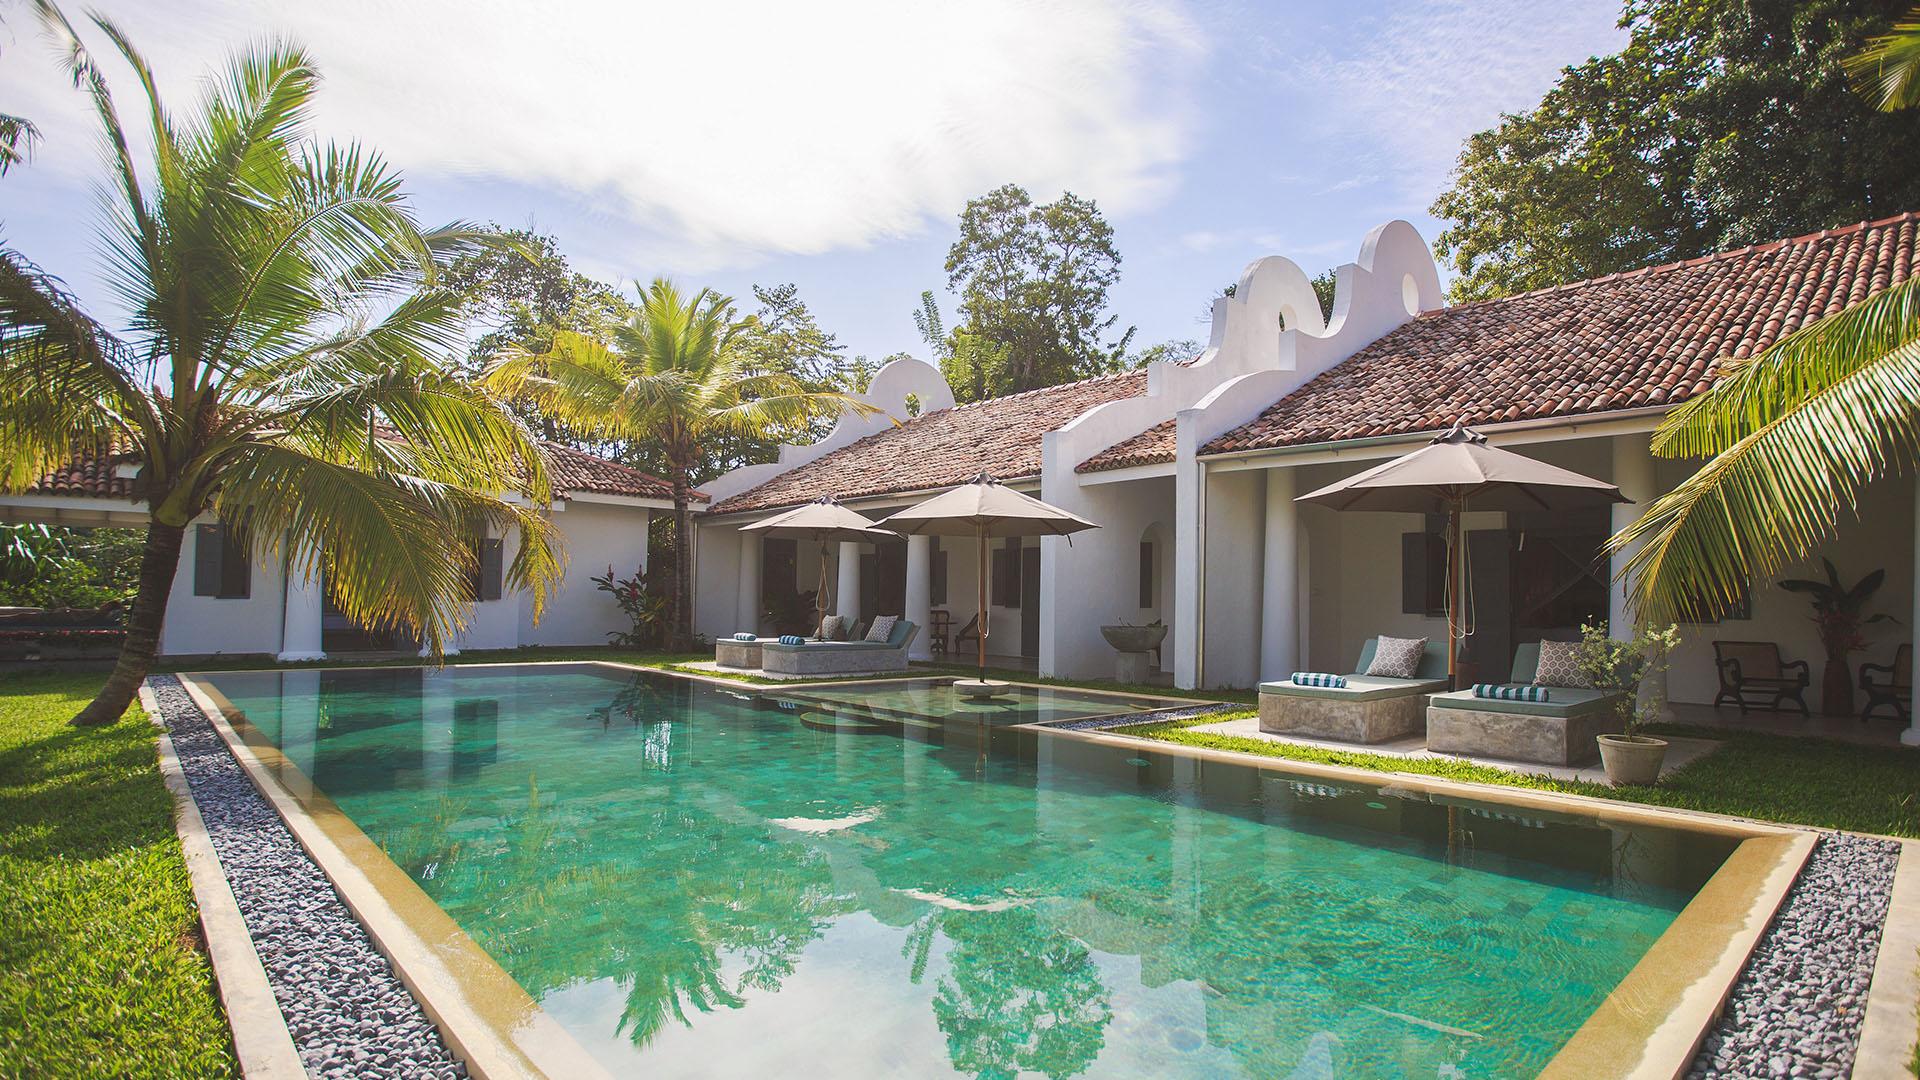 Sri_lanka_holiday_villa_sissila_general_Sri_lanka_holiday_villa_sissila_general_08.jpg